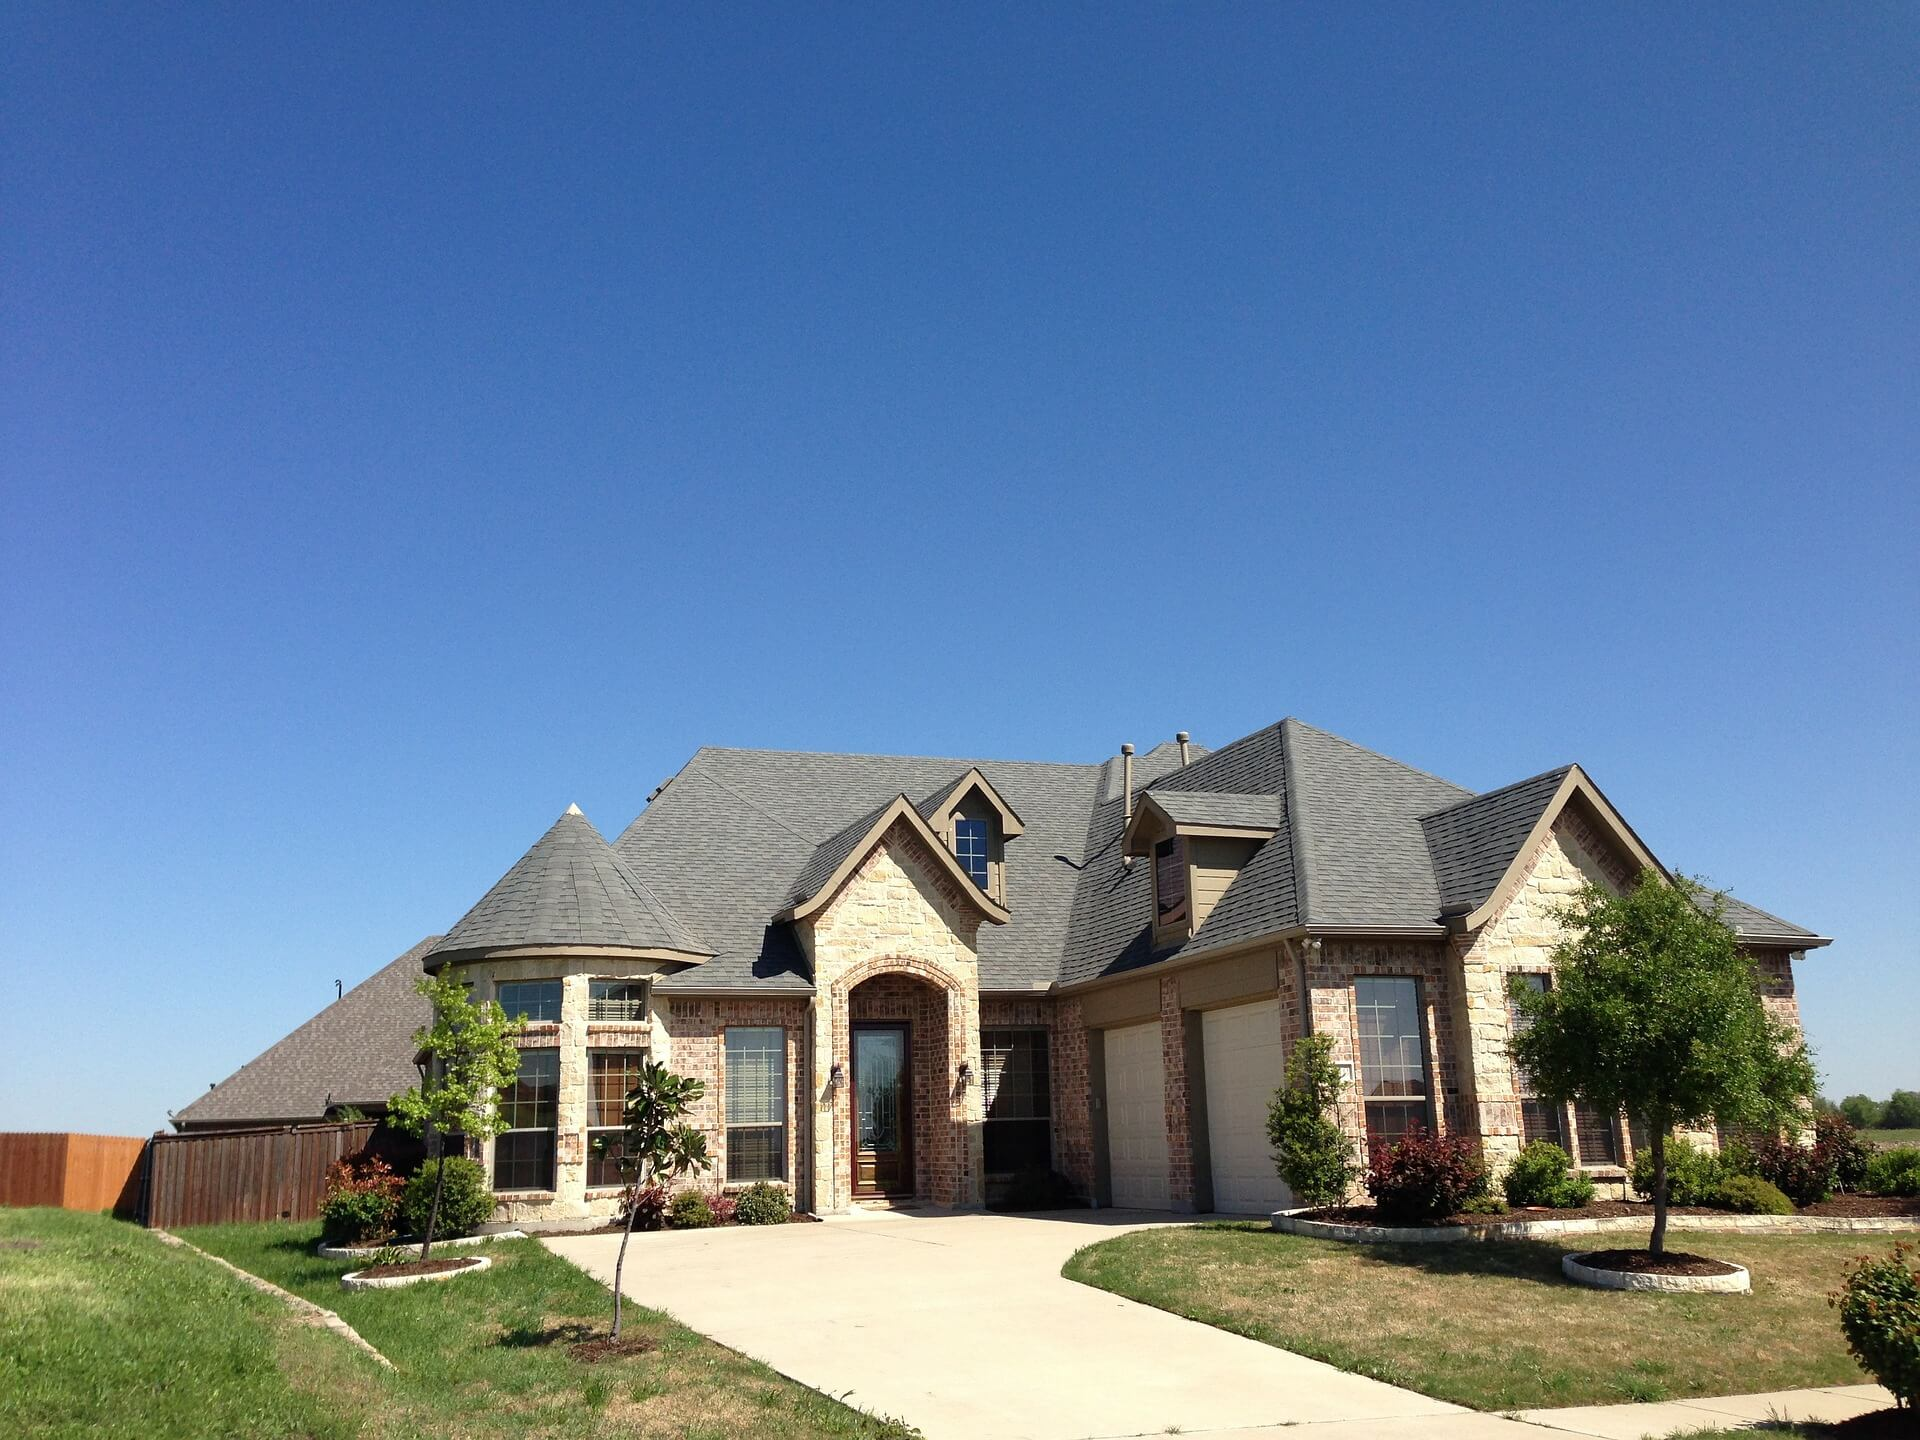 Essential Tips for Building a Home & Essential Tips for Building a Home \u2013 Interior Design Design News ...